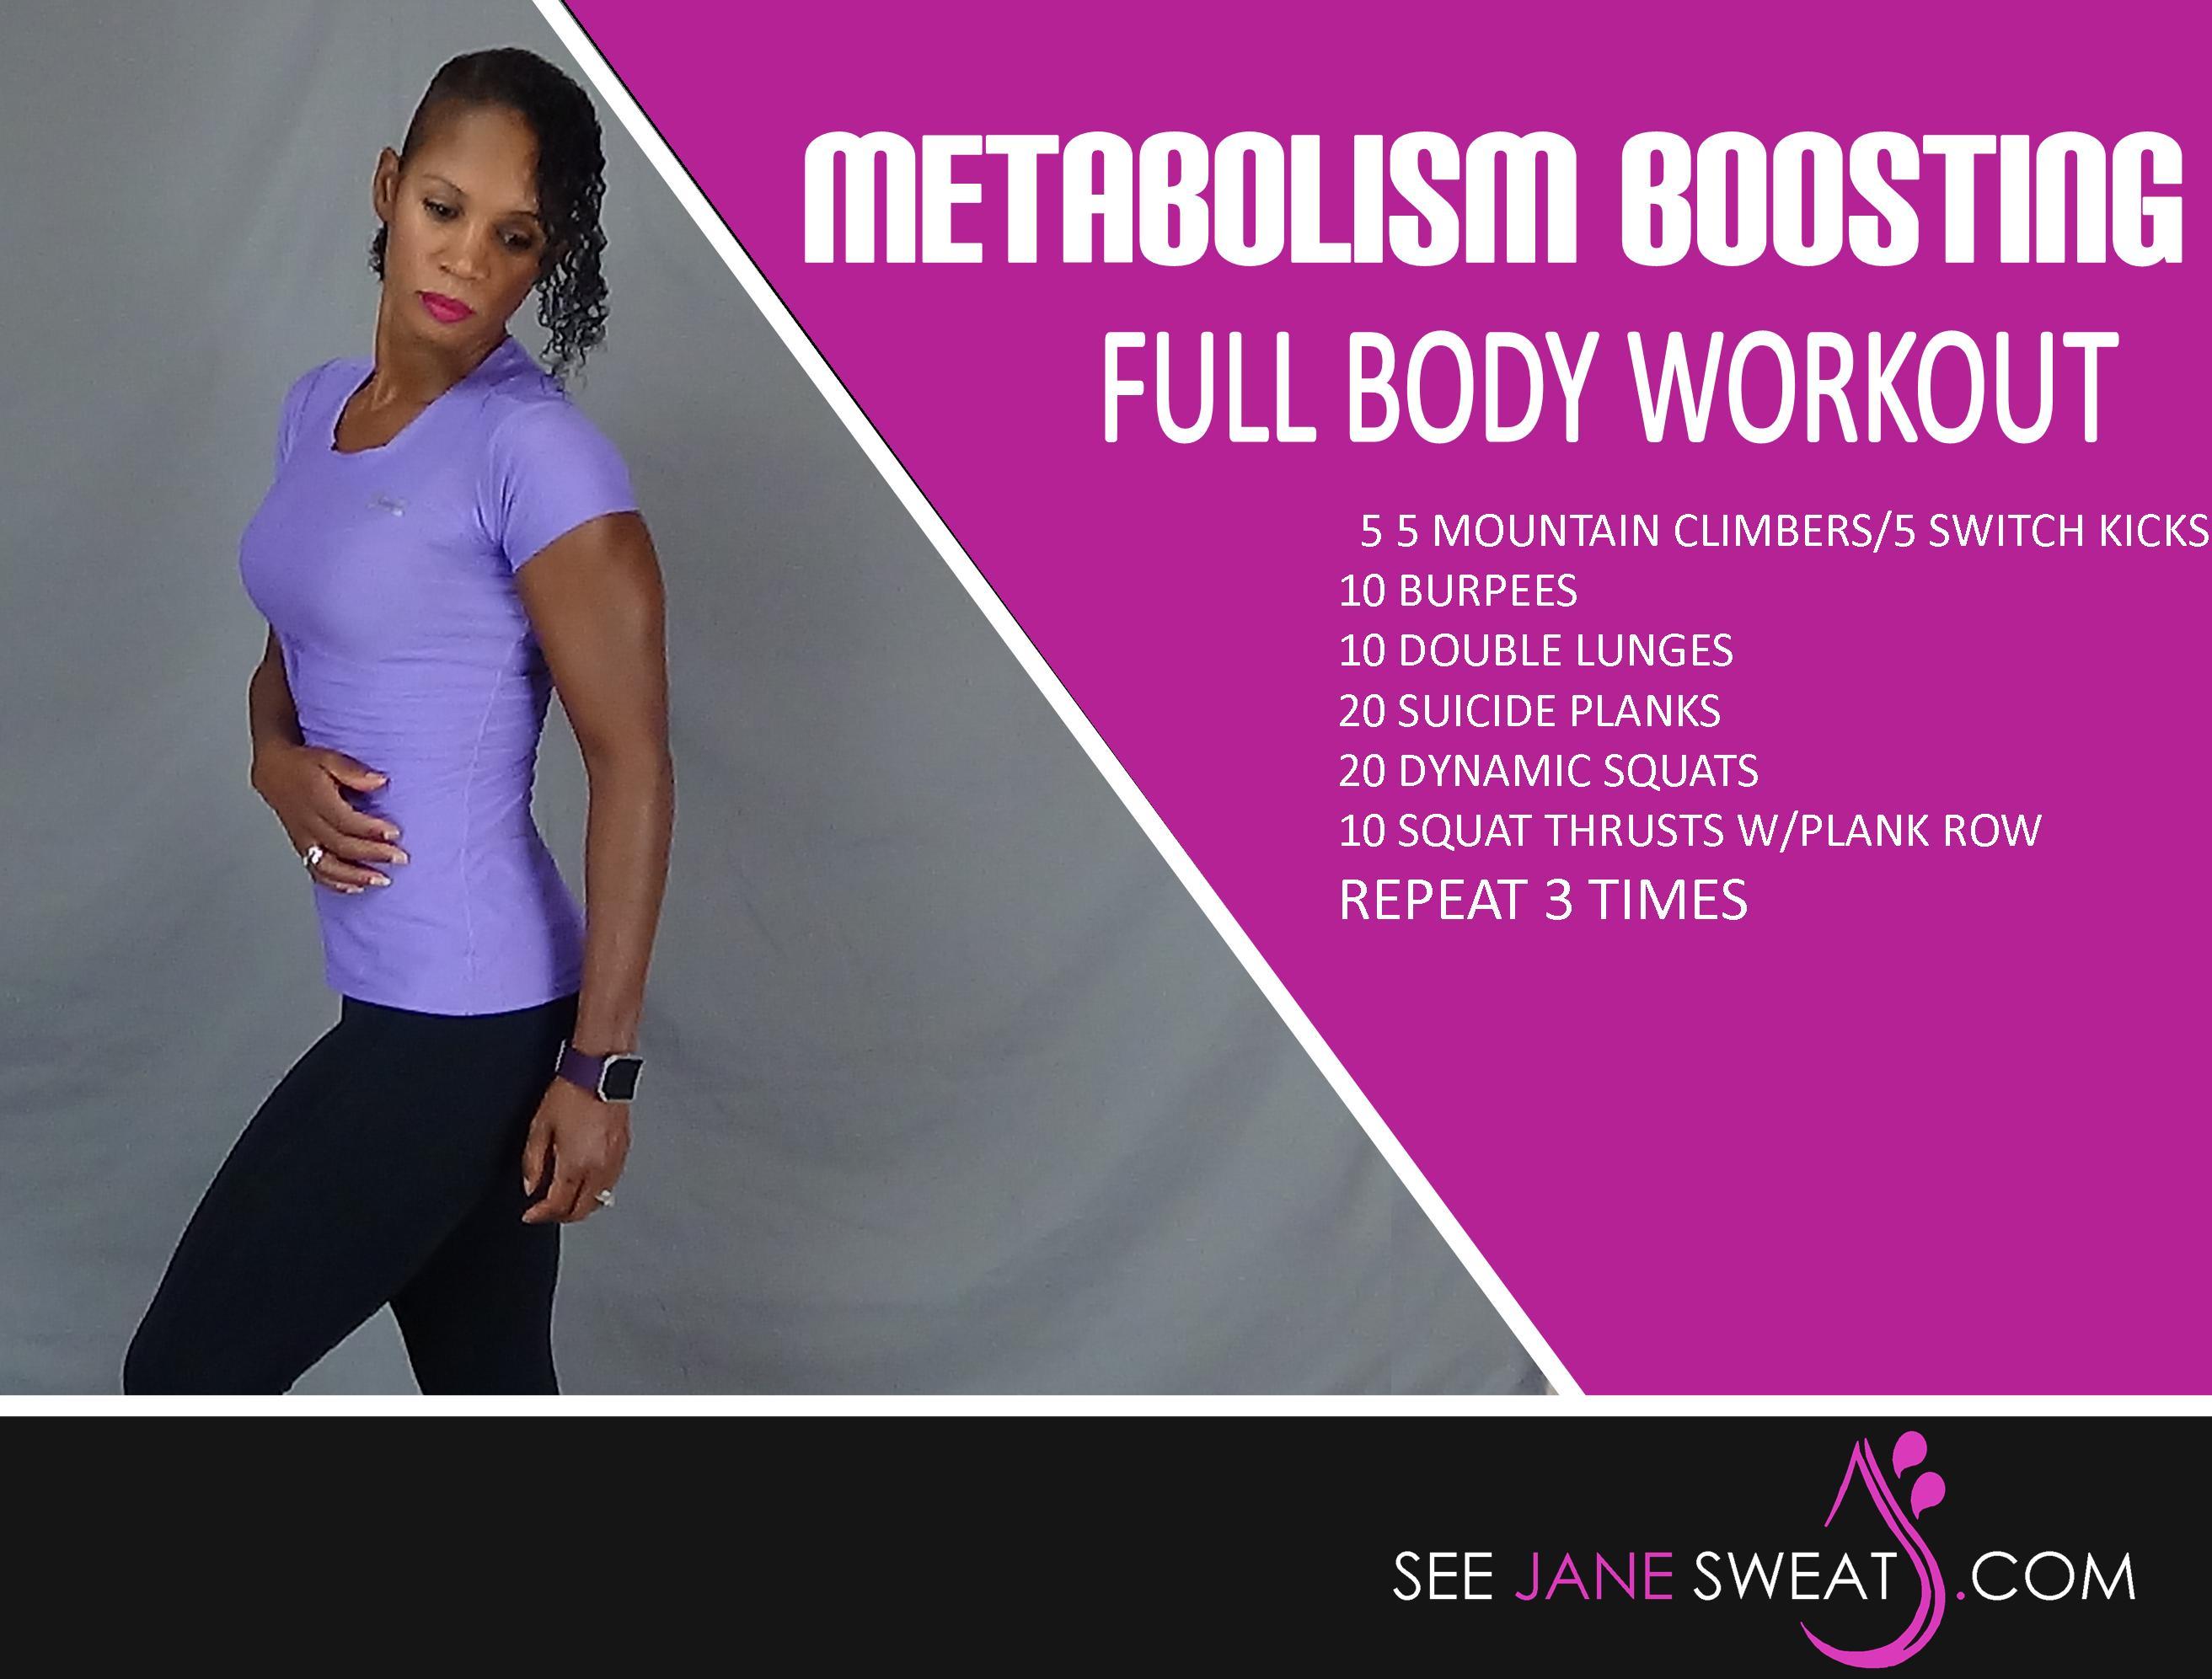 Metabolism Boosting Full Body Workout